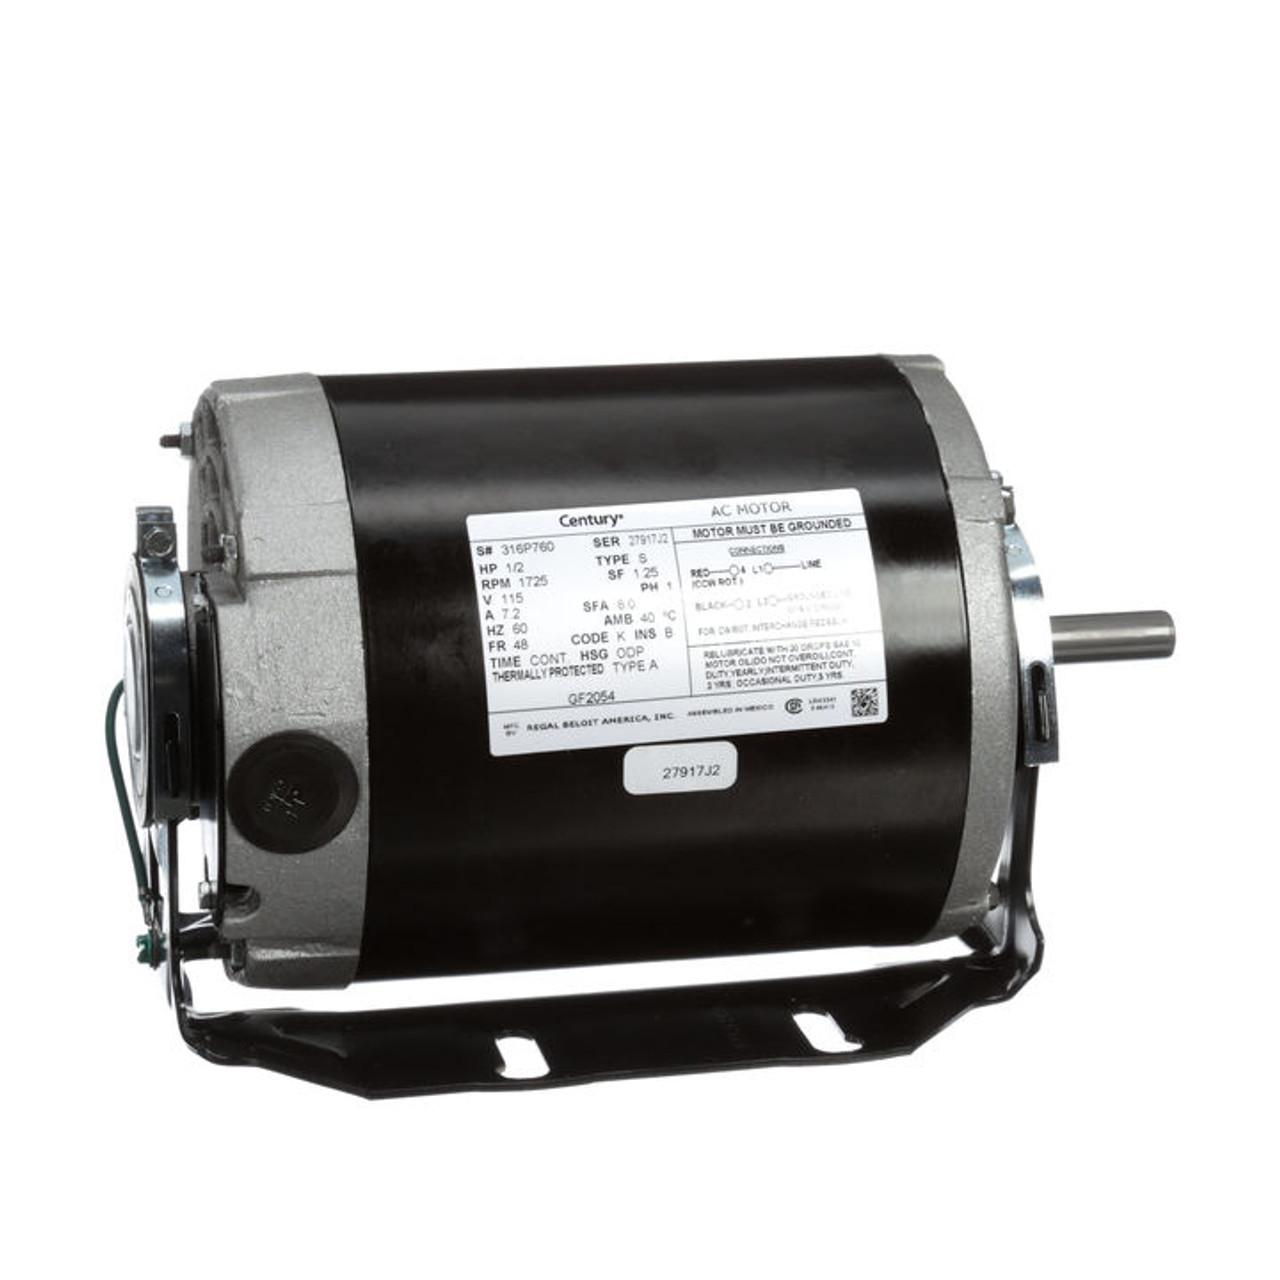 Gf2054 Century 1 2 Hp 1725 Rpm 48 Frame 115v Belt Drive Furnace Motor